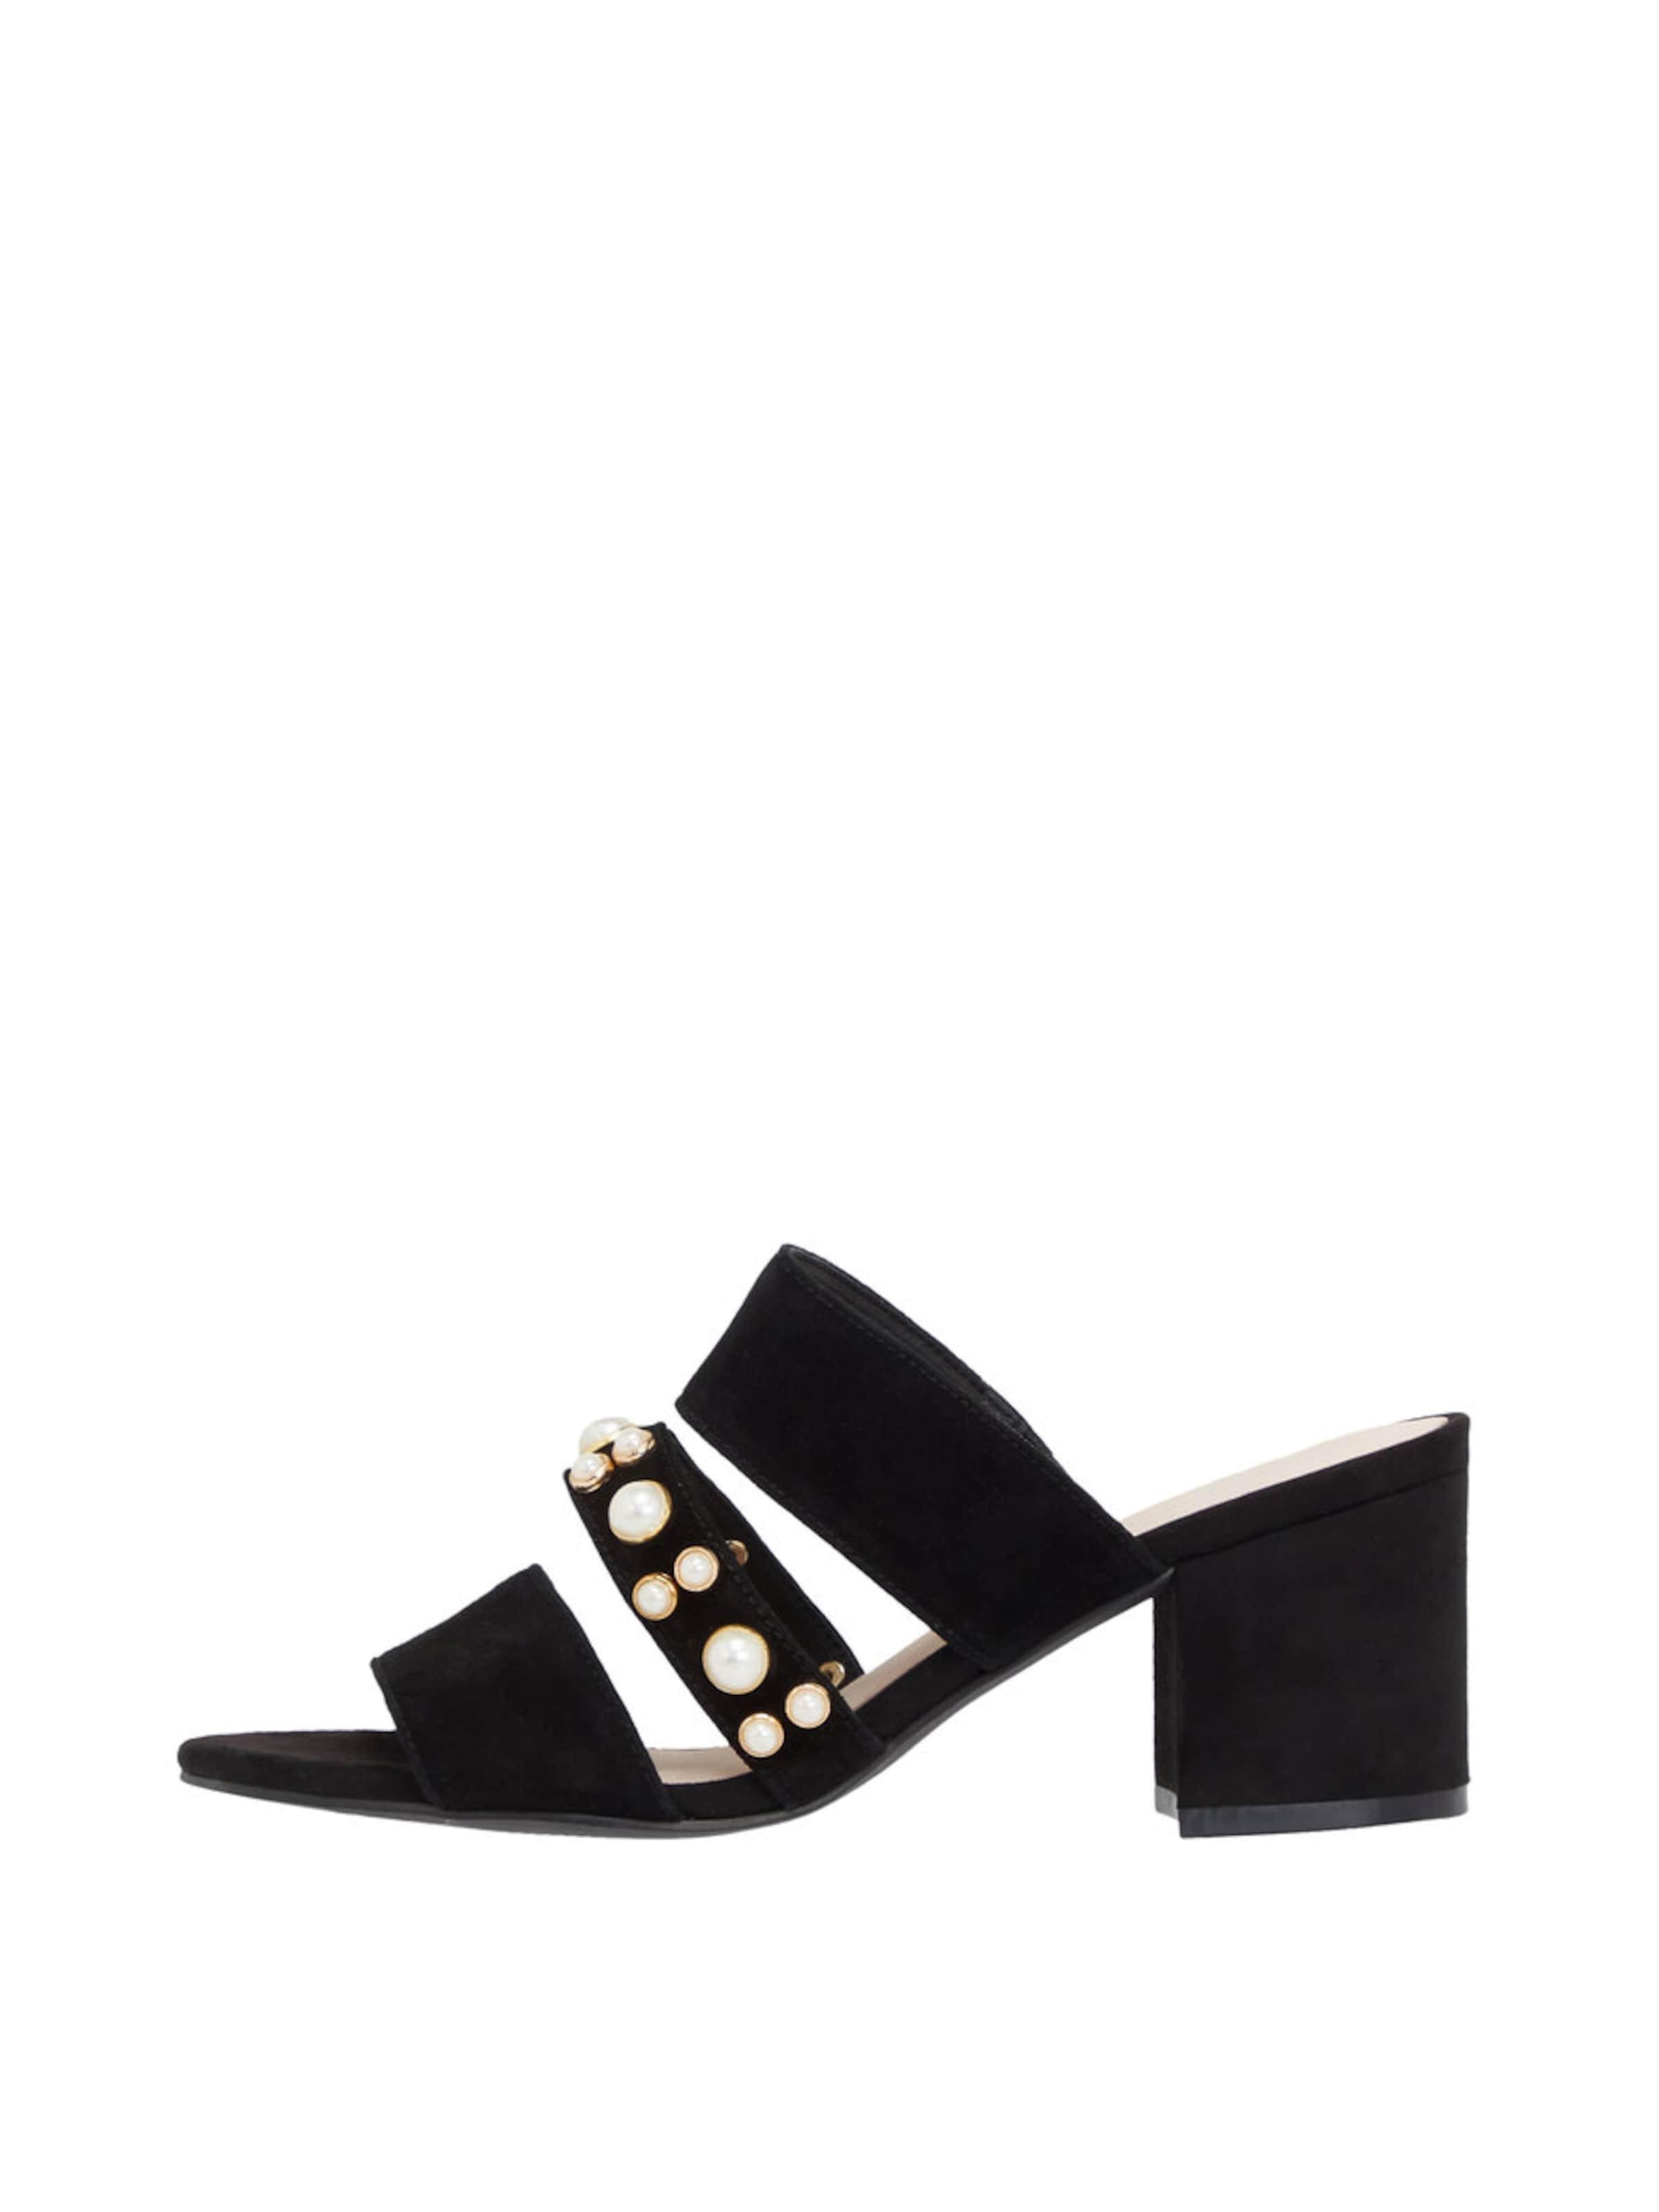 Bianco Perlenriemen Sandalen Verschleißfeste billige Schuhe